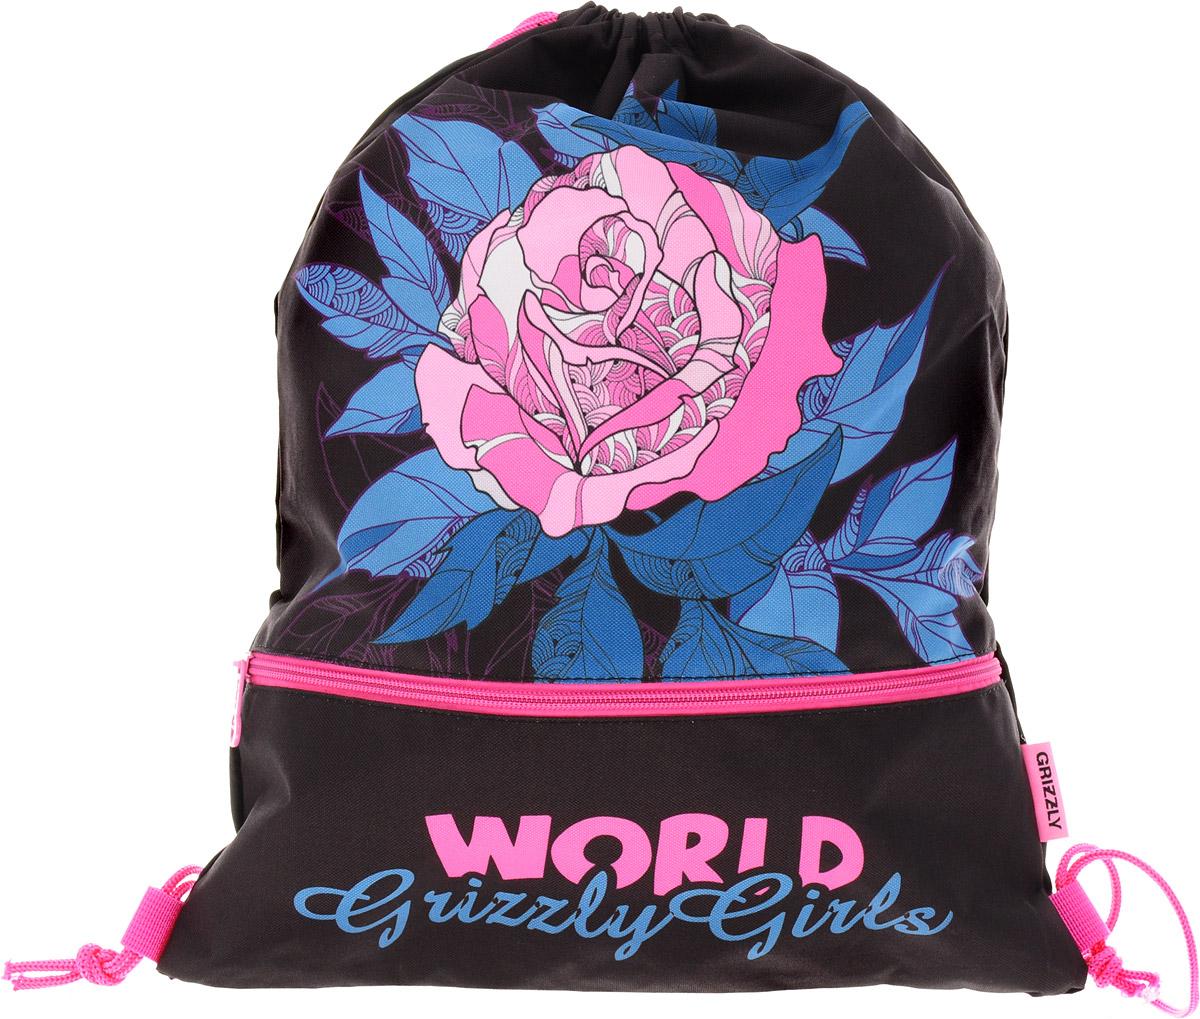 Grizzly Мешок для сменной обуви World Grizzly Girls цвет черный розовый grizzly мешок для сменной обуви футбол цвет синий